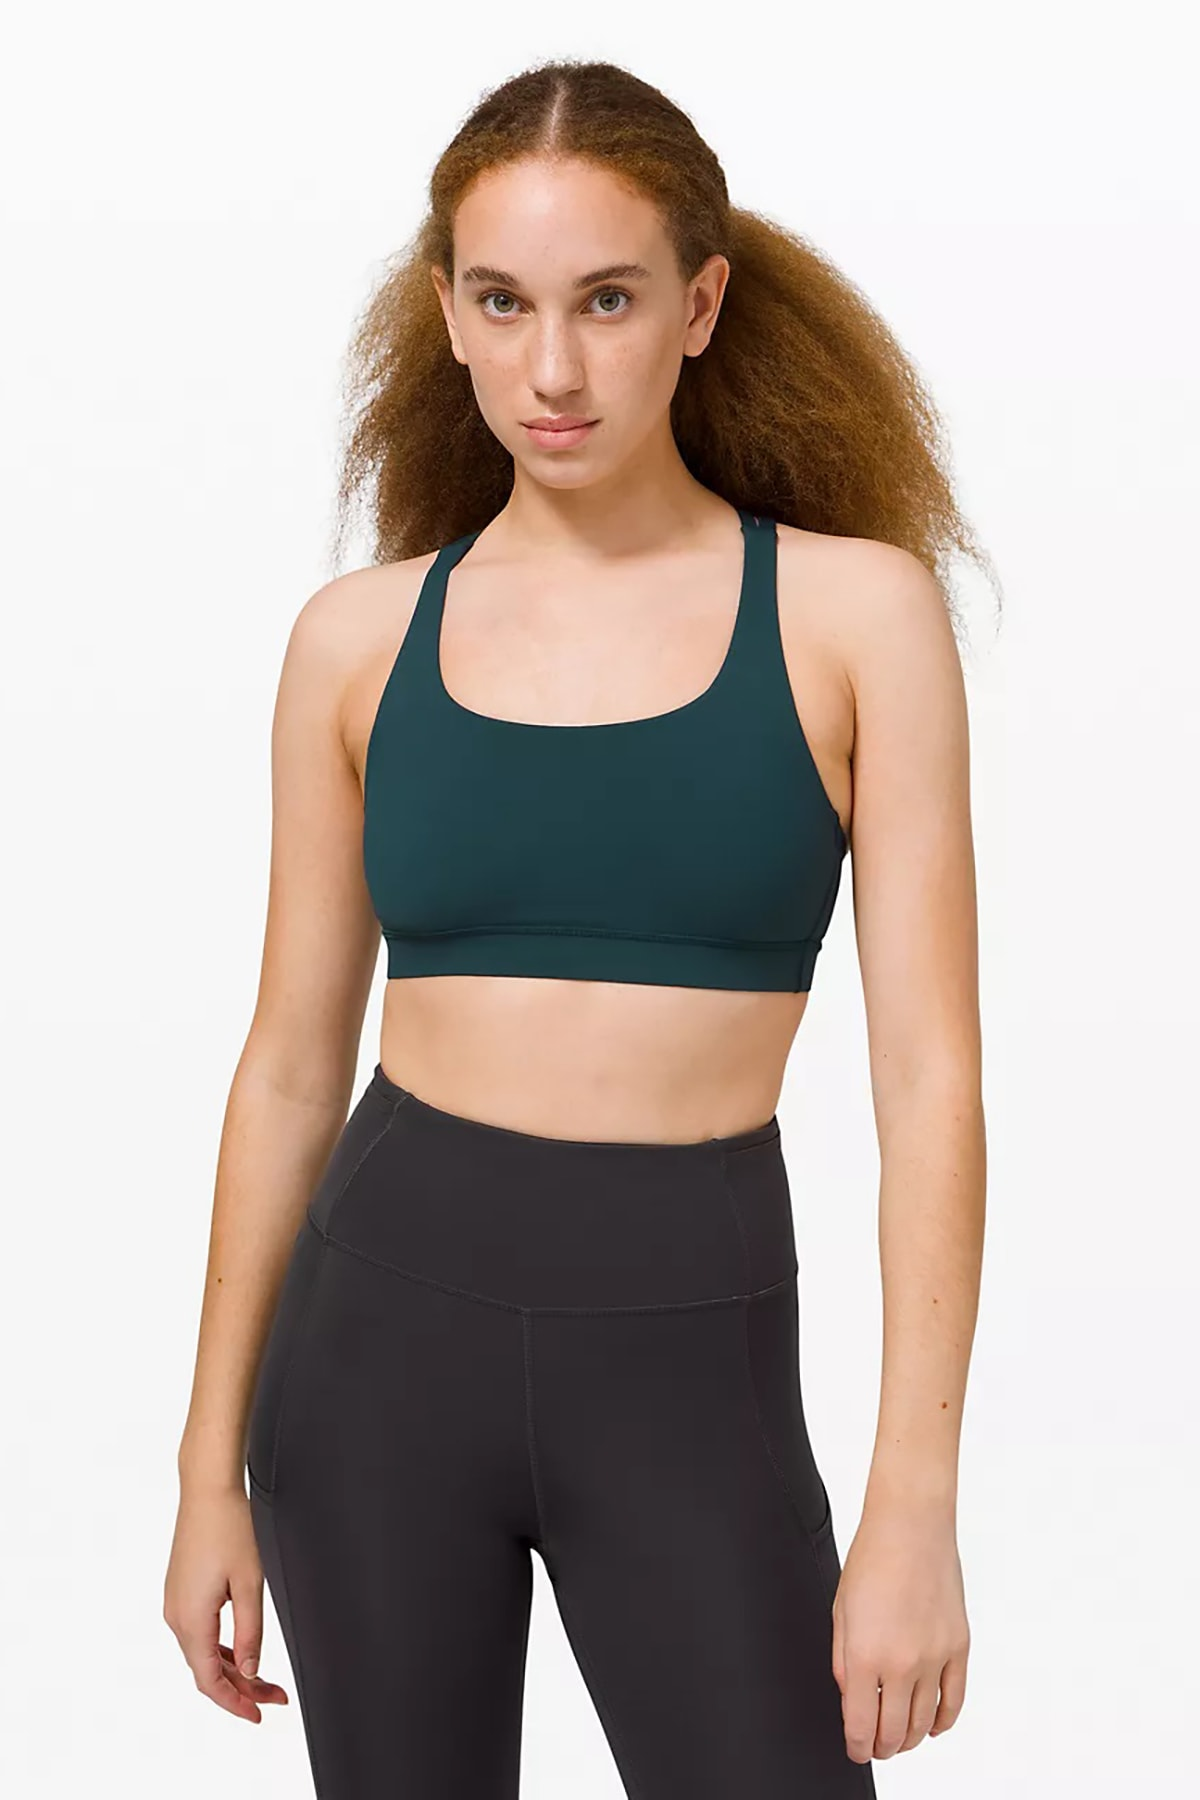 Lululemon fitness gear